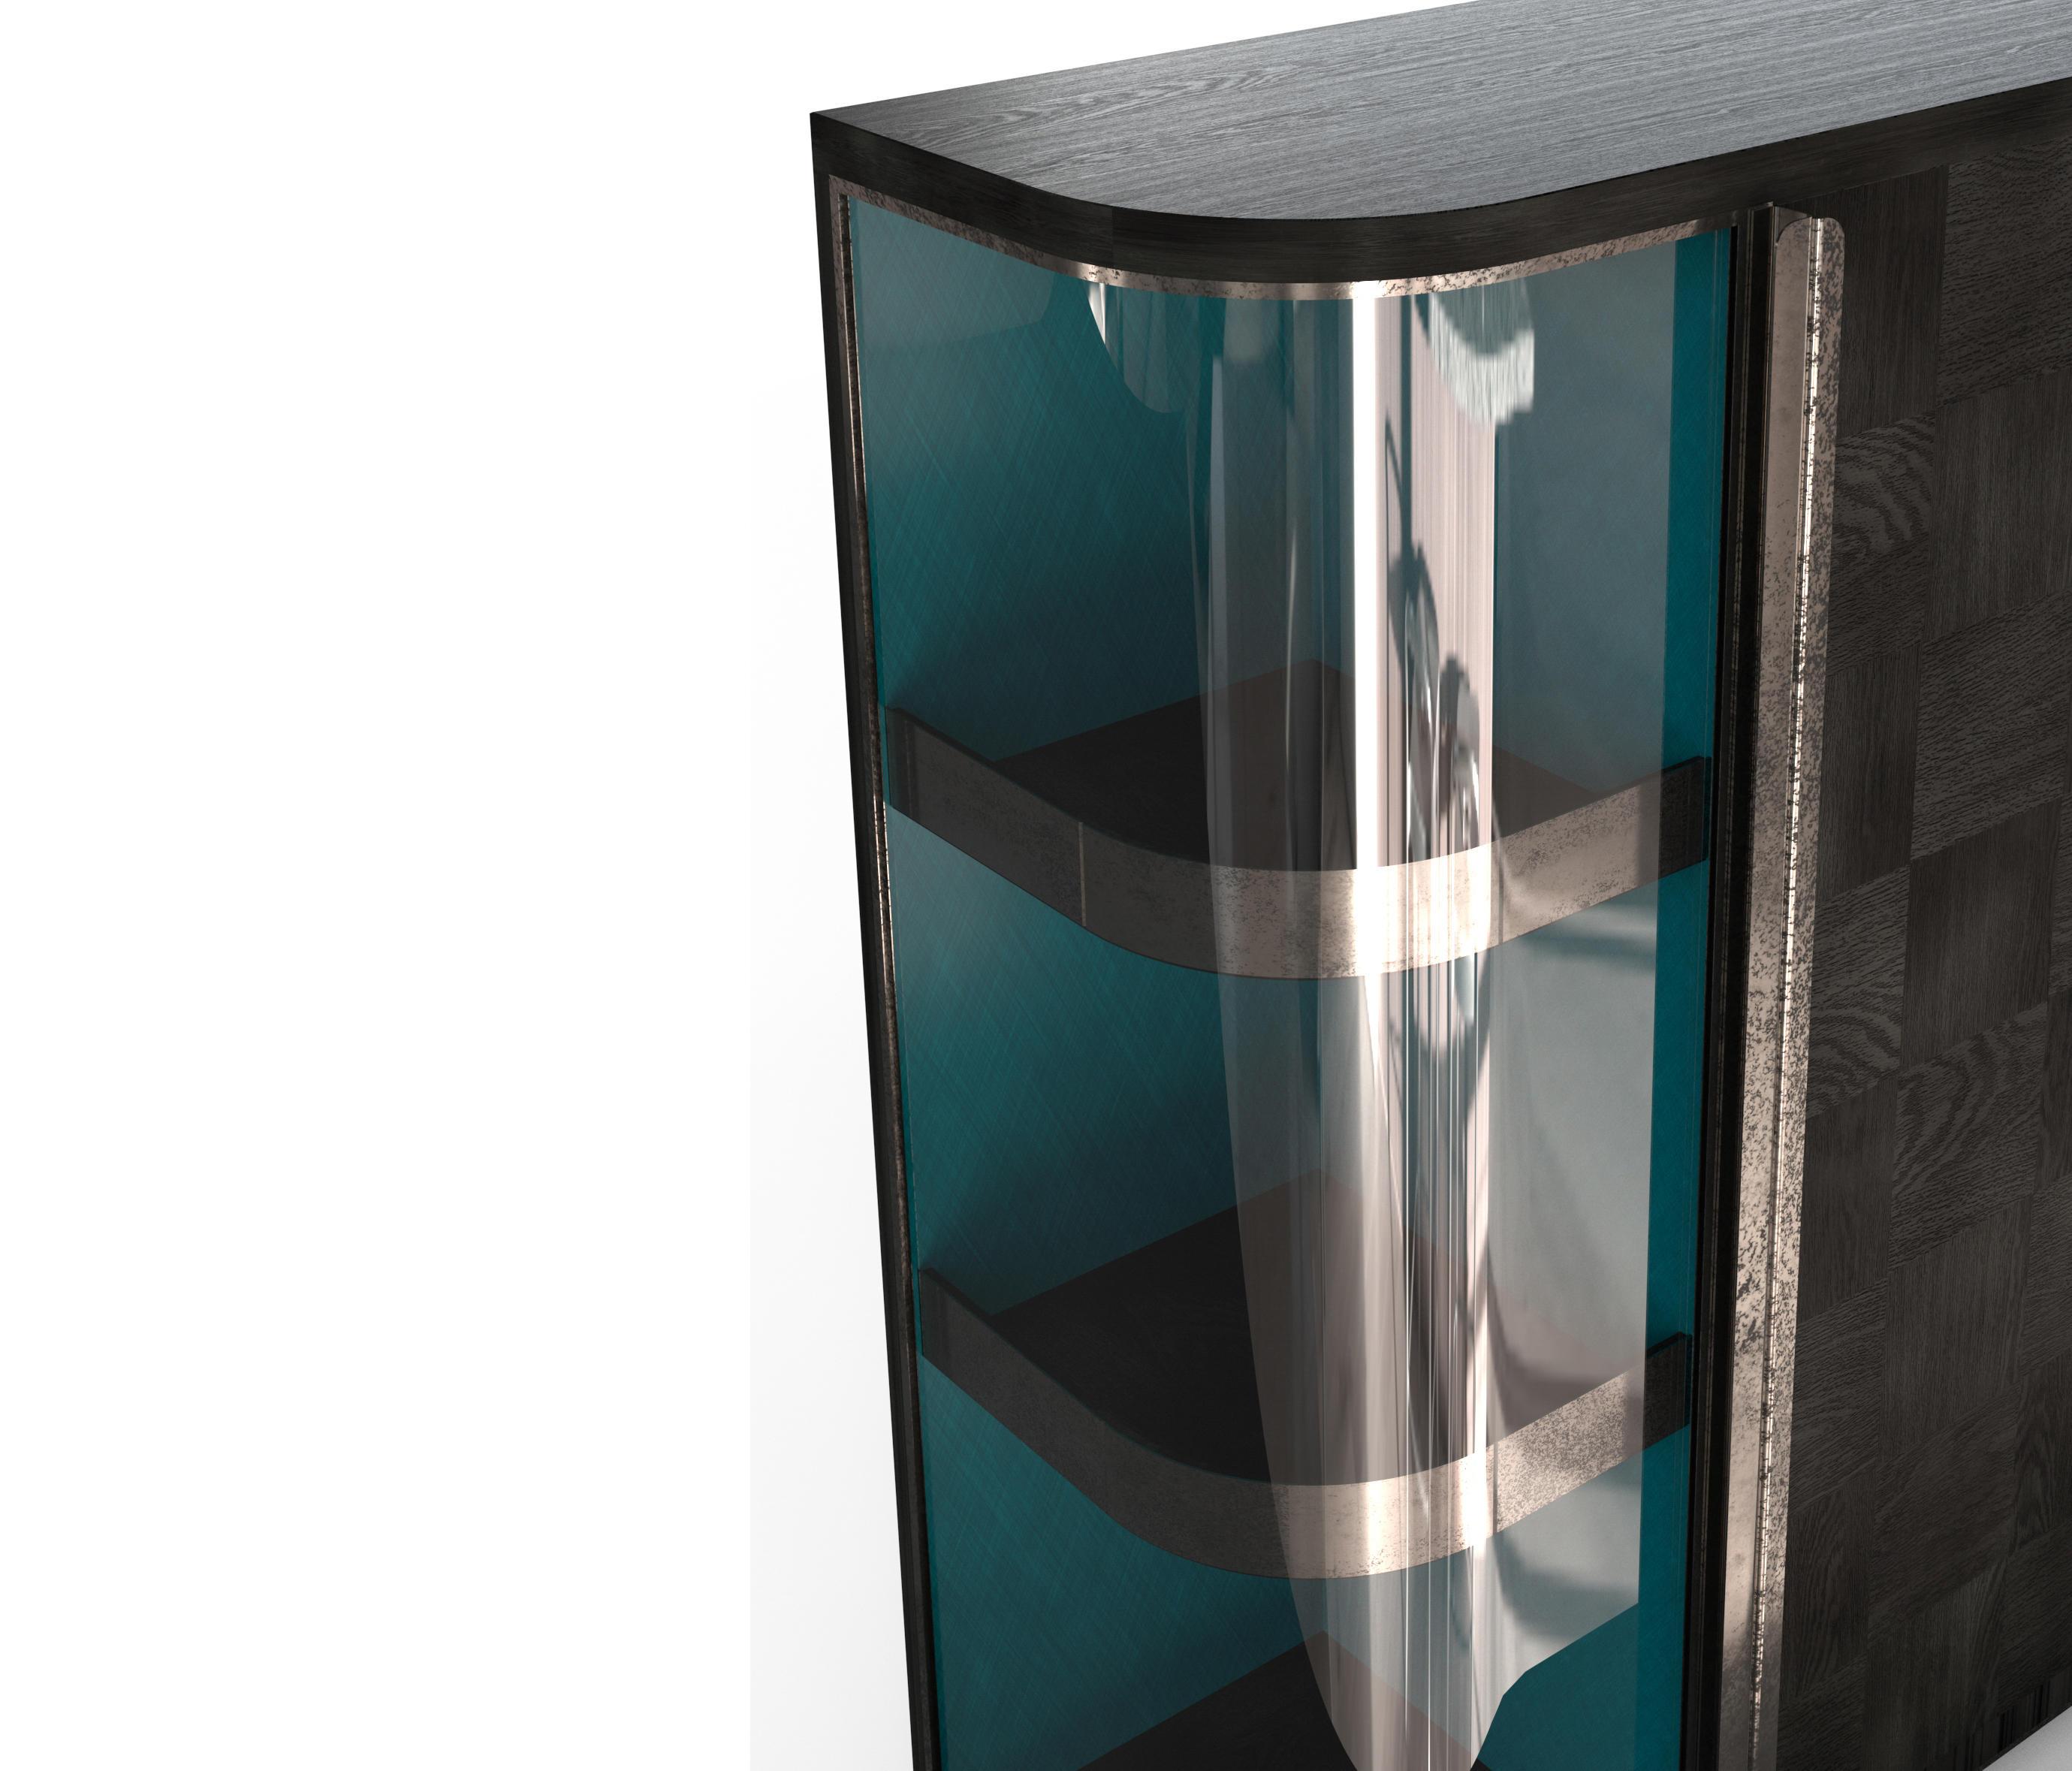 fleurs du mal spleen cabinet sideboards from giopagani architonic. Black Bedroom Furniture Sets. Home Design Ideas